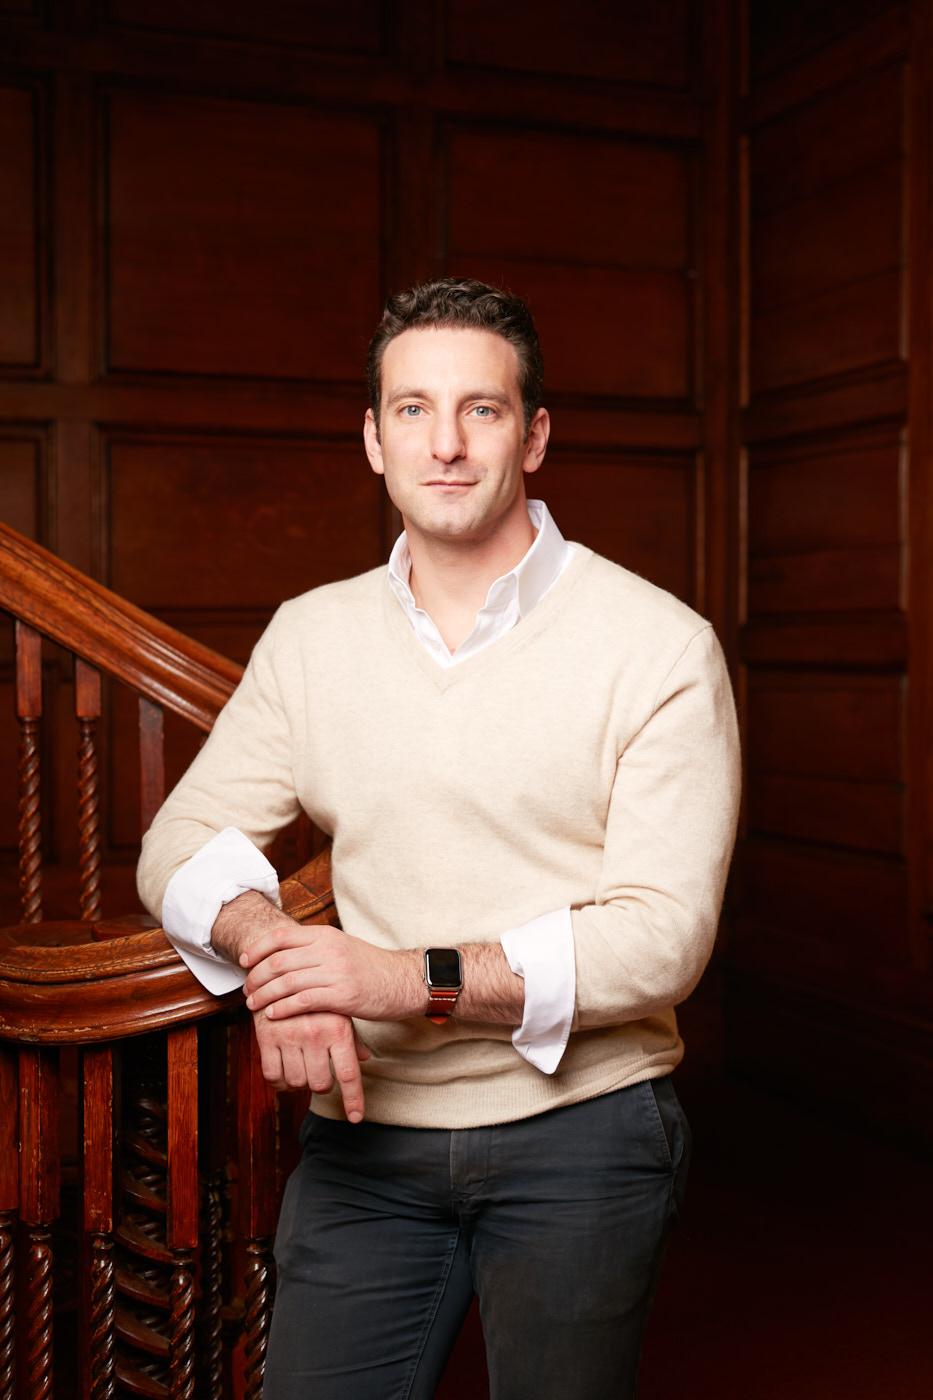 Portraits of Yale University economist Zack Copper in secret society house New Haven, CT